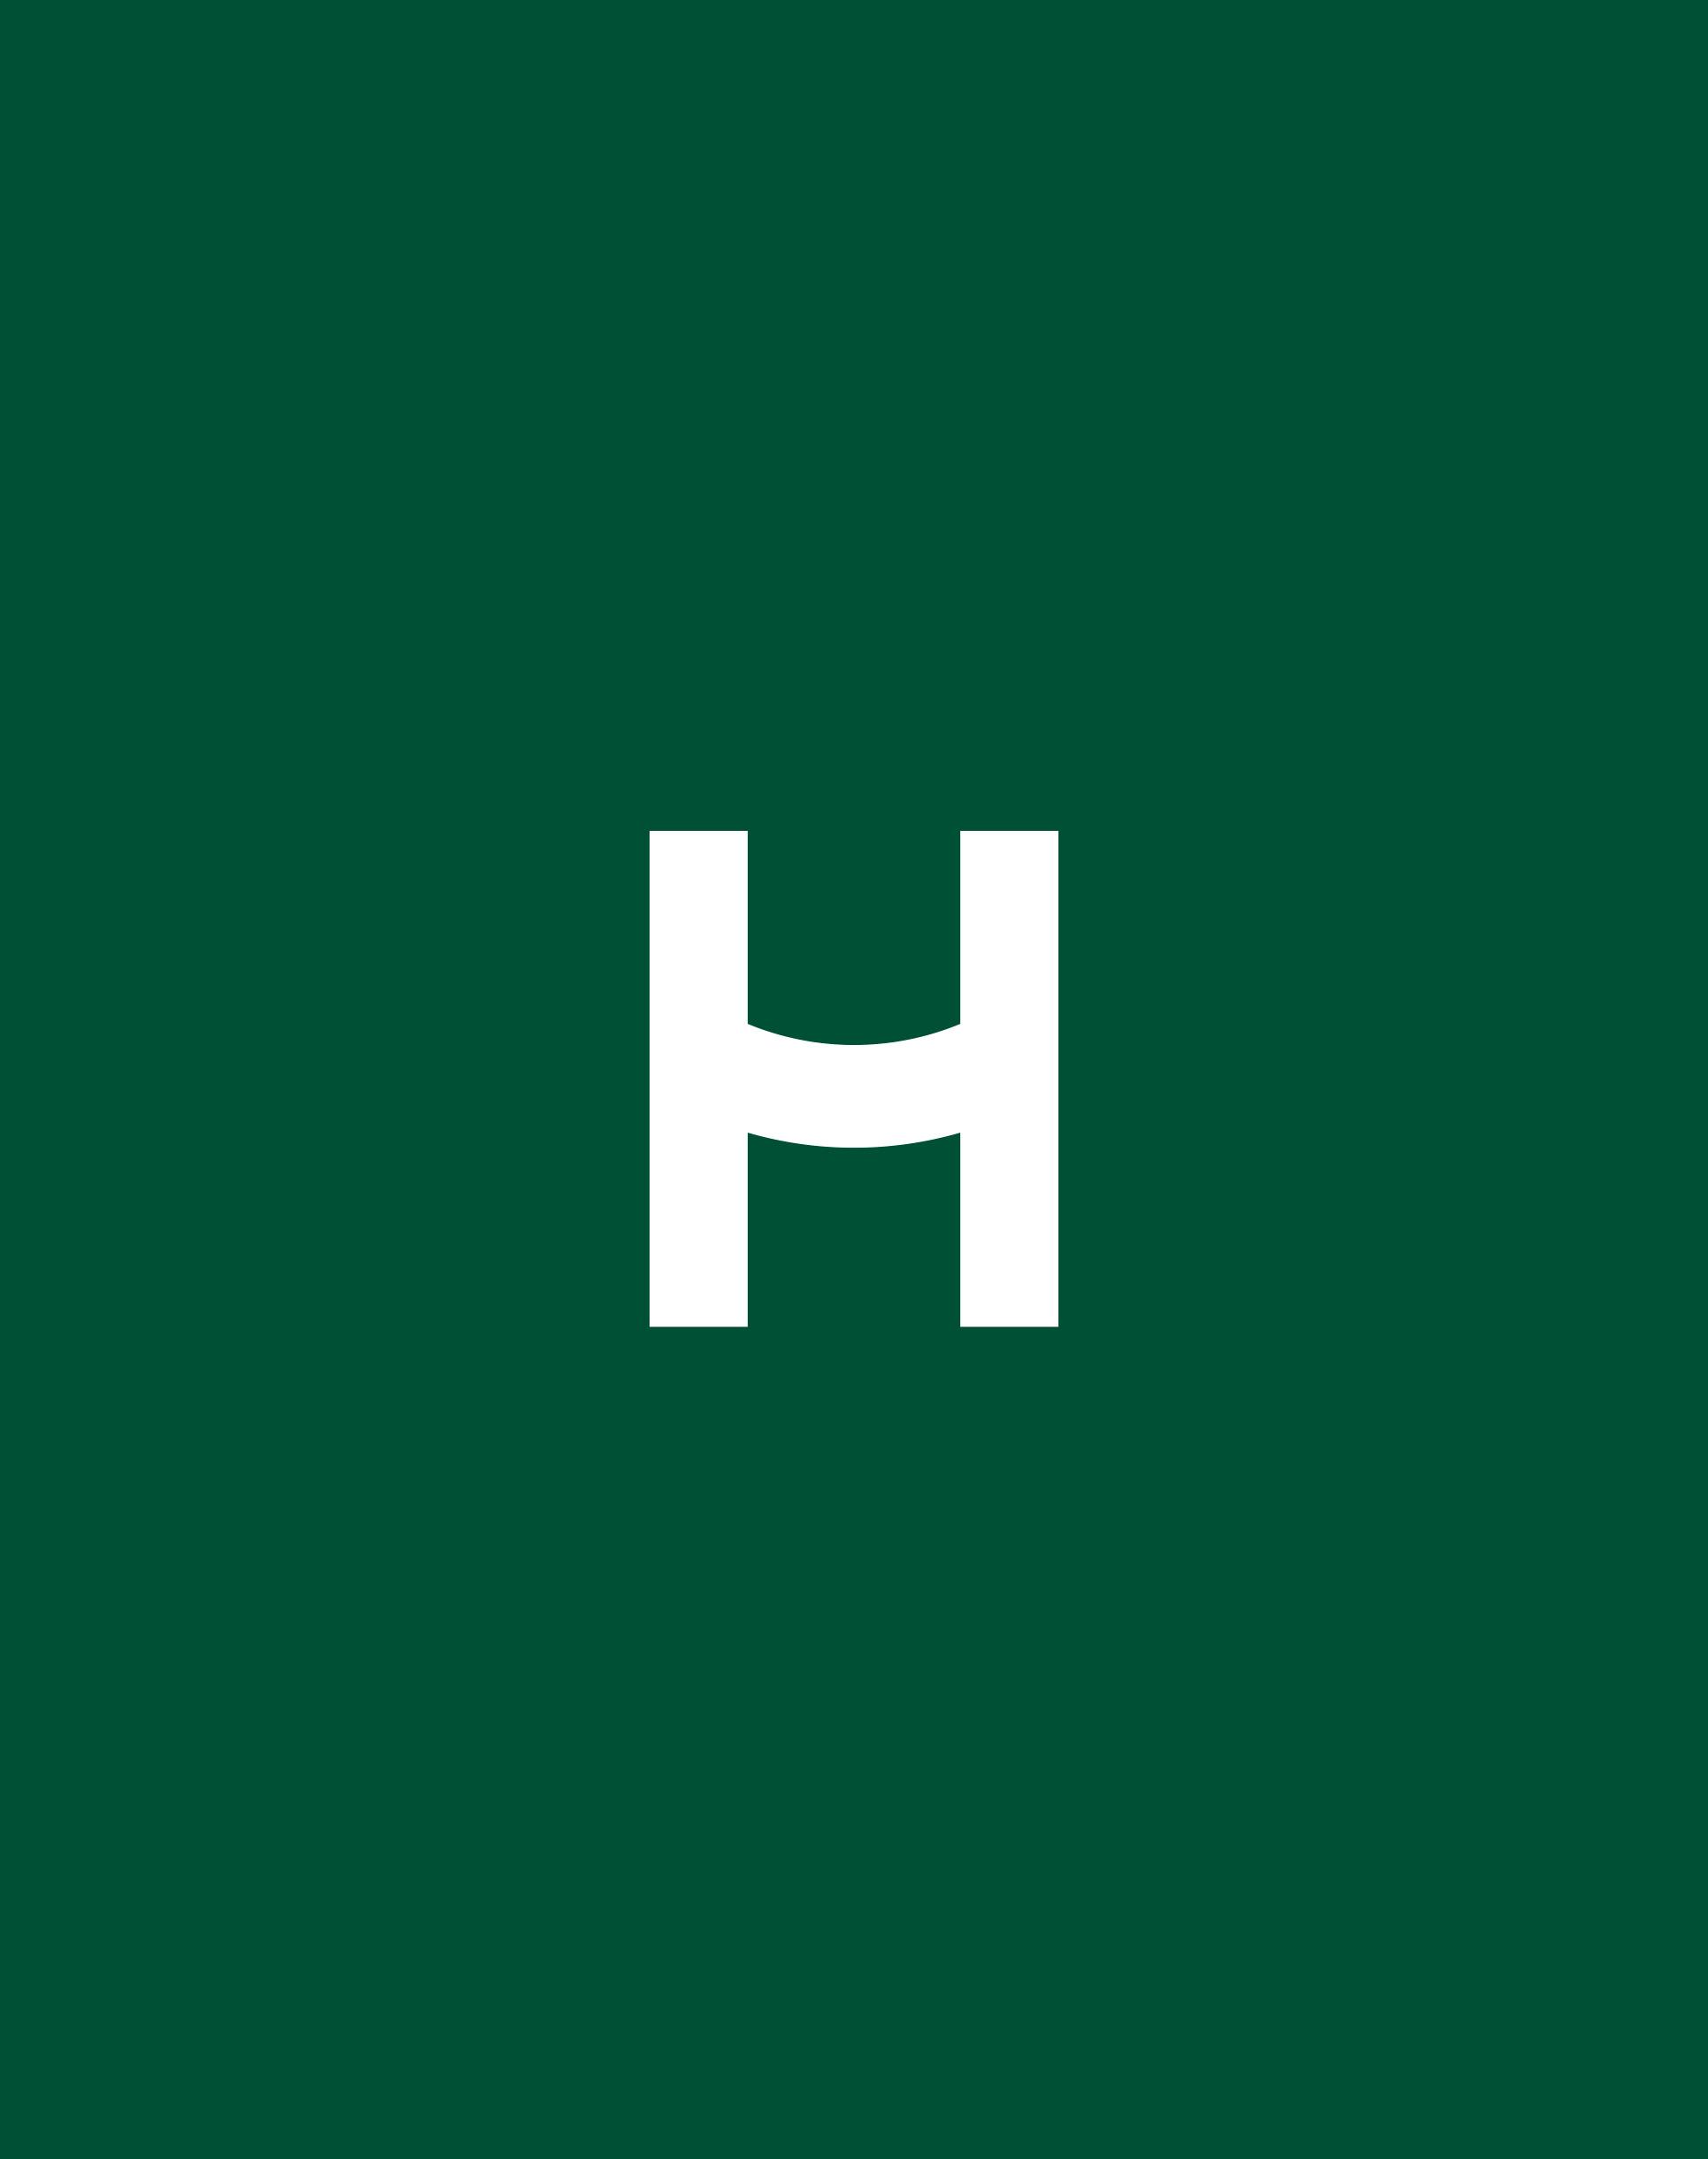 HappyMaven logo mark –H monogram with a smile